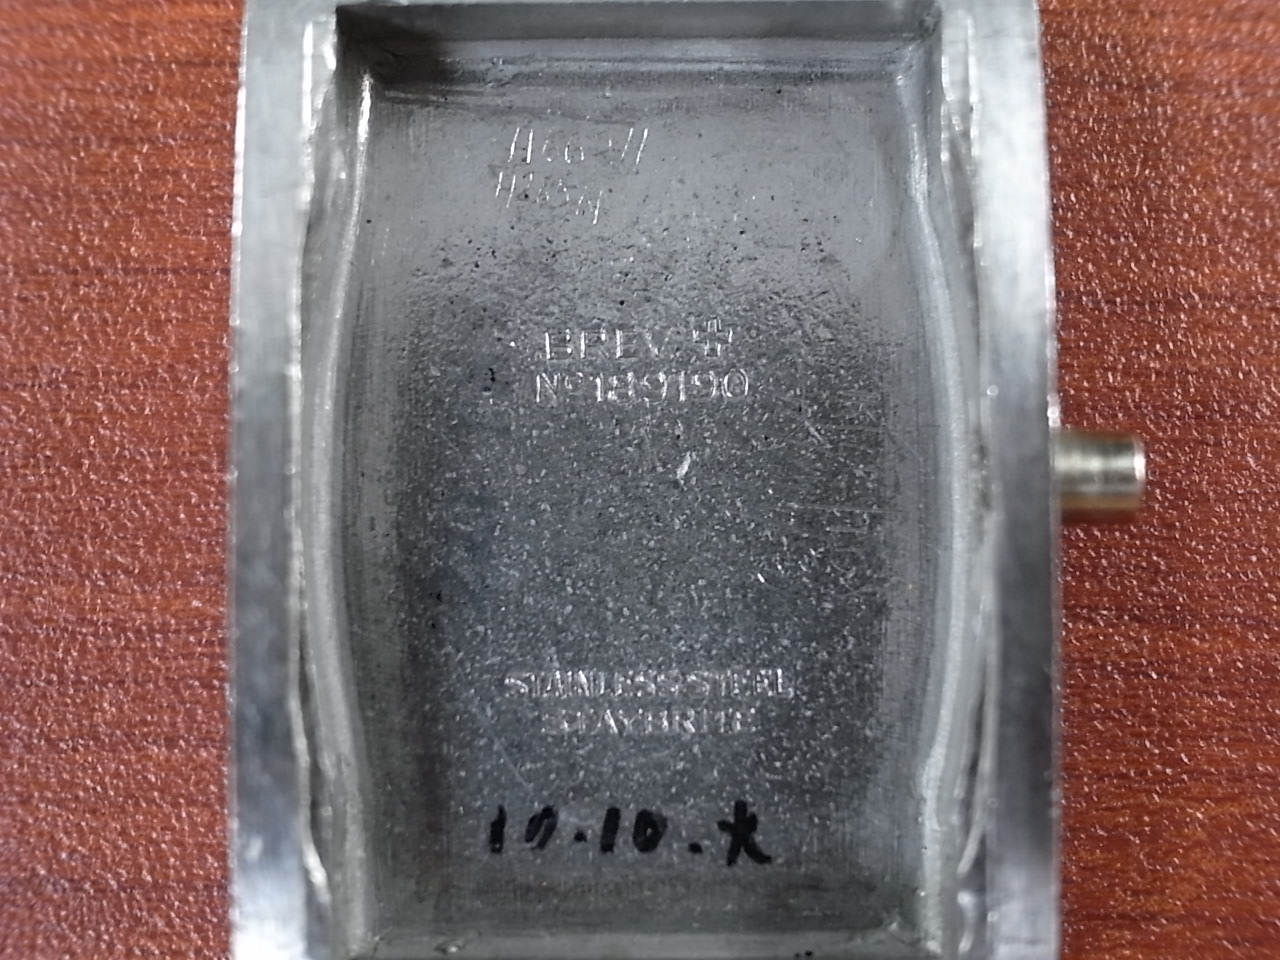 J.W.ベンソン レクタンギュラー 4つビス防水ケース ローマンインデックスの写真6枚目